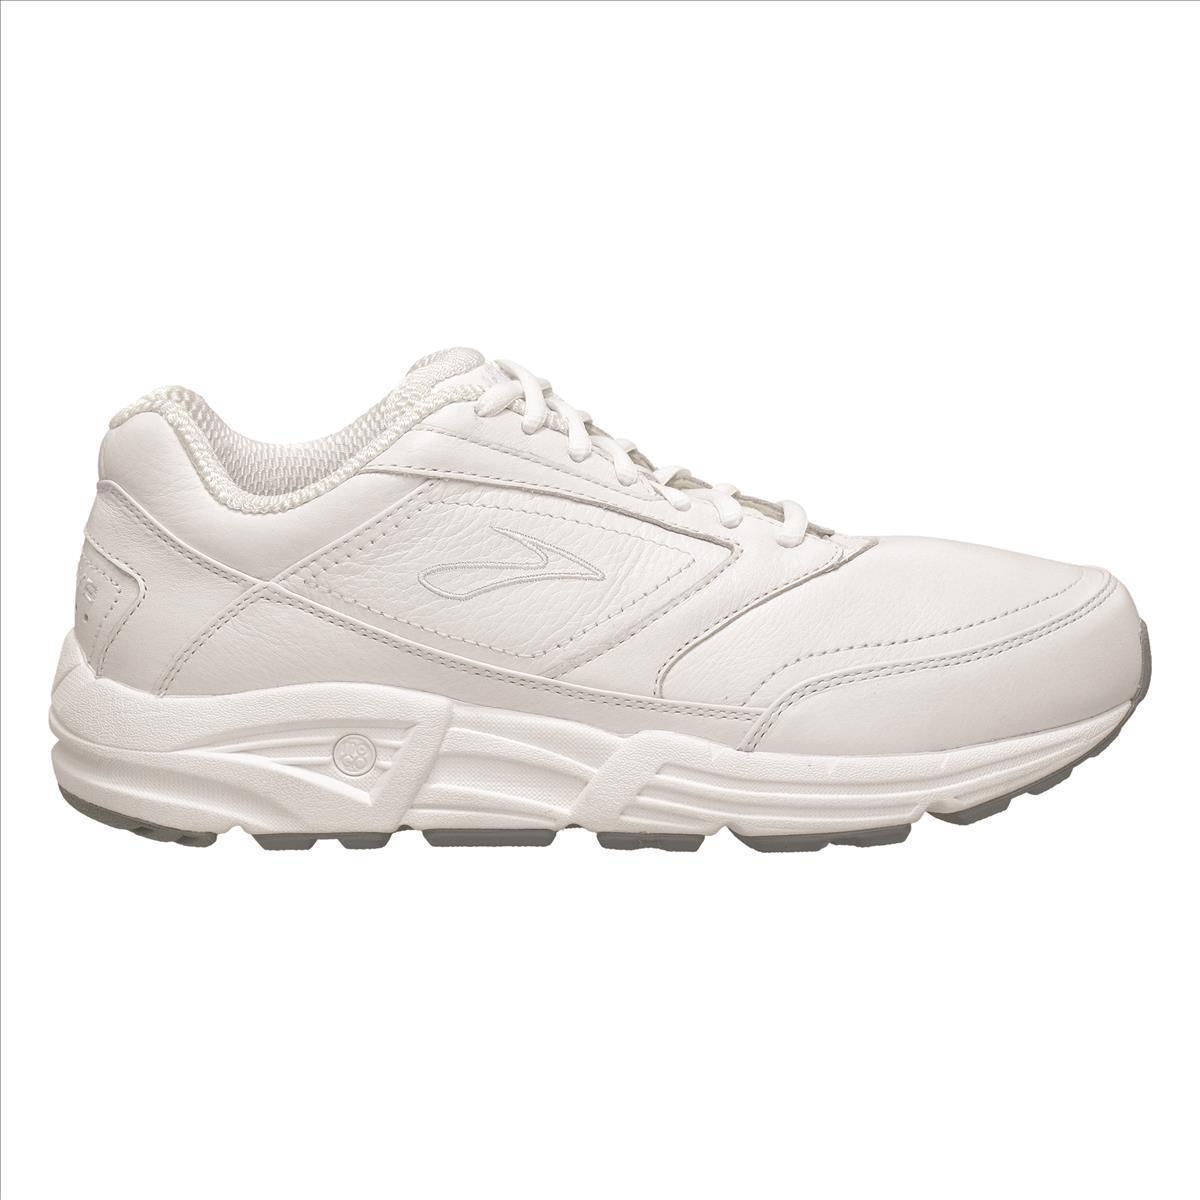 Brooks Addiction Walker Donna Shoes (B) (111) + Australia Free Delivery Australia + Wide 2e2558